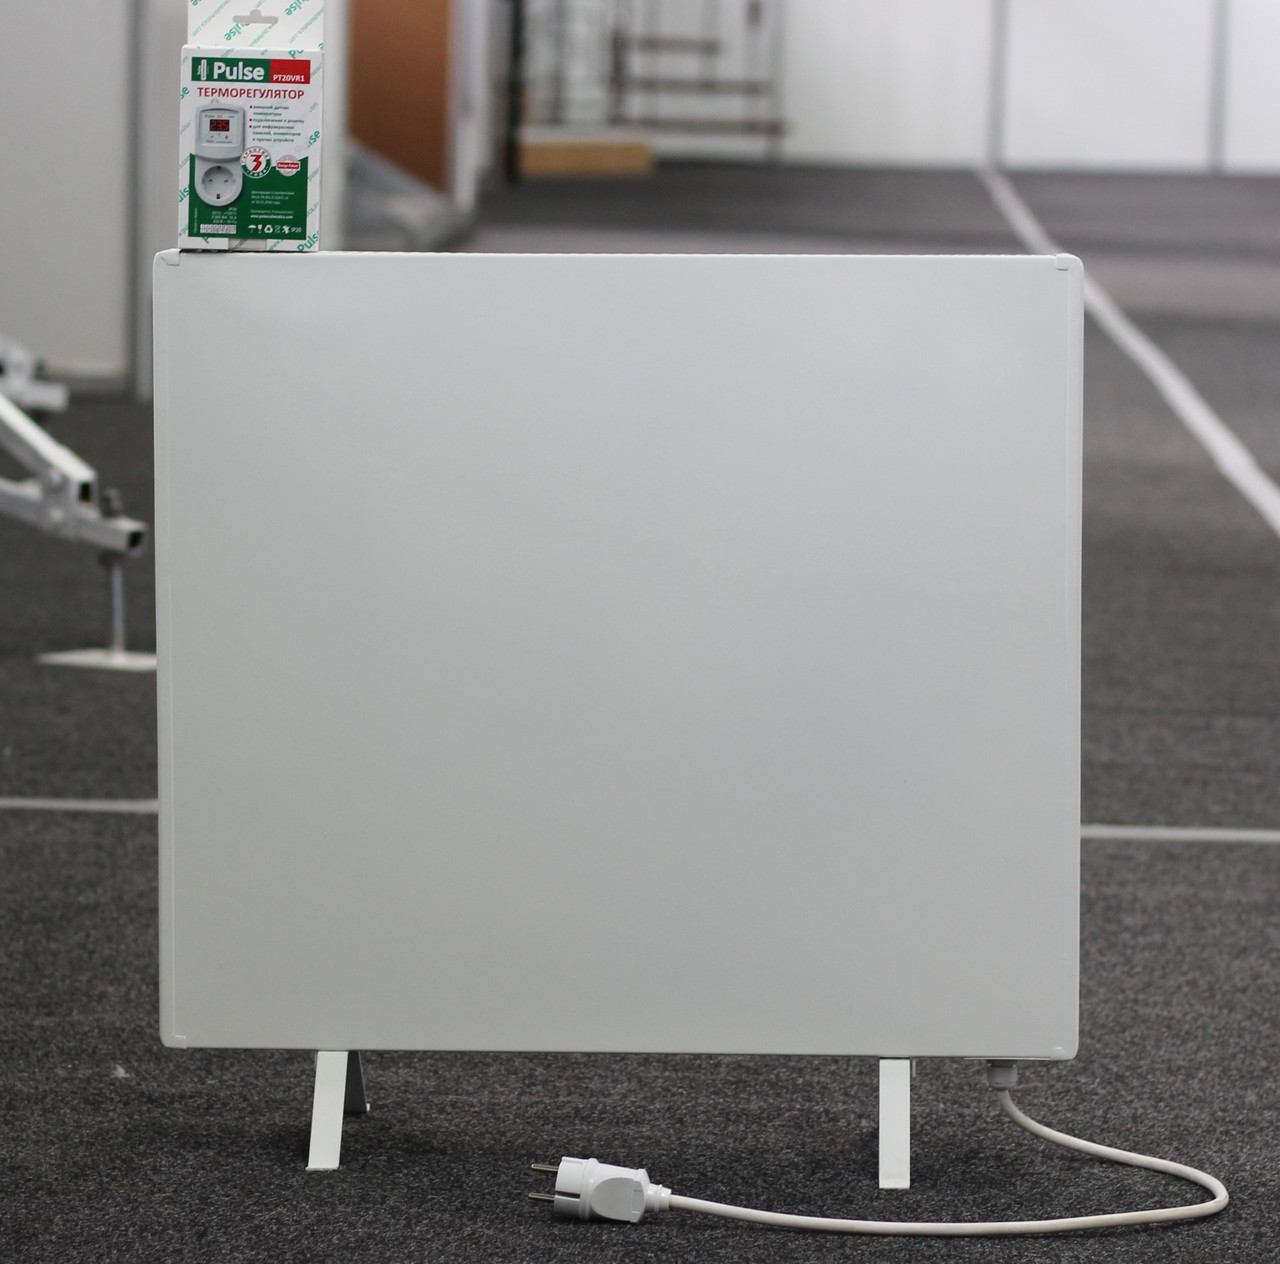 Електрична теплова панель Pulse 300 (600mm) + терморегулятор